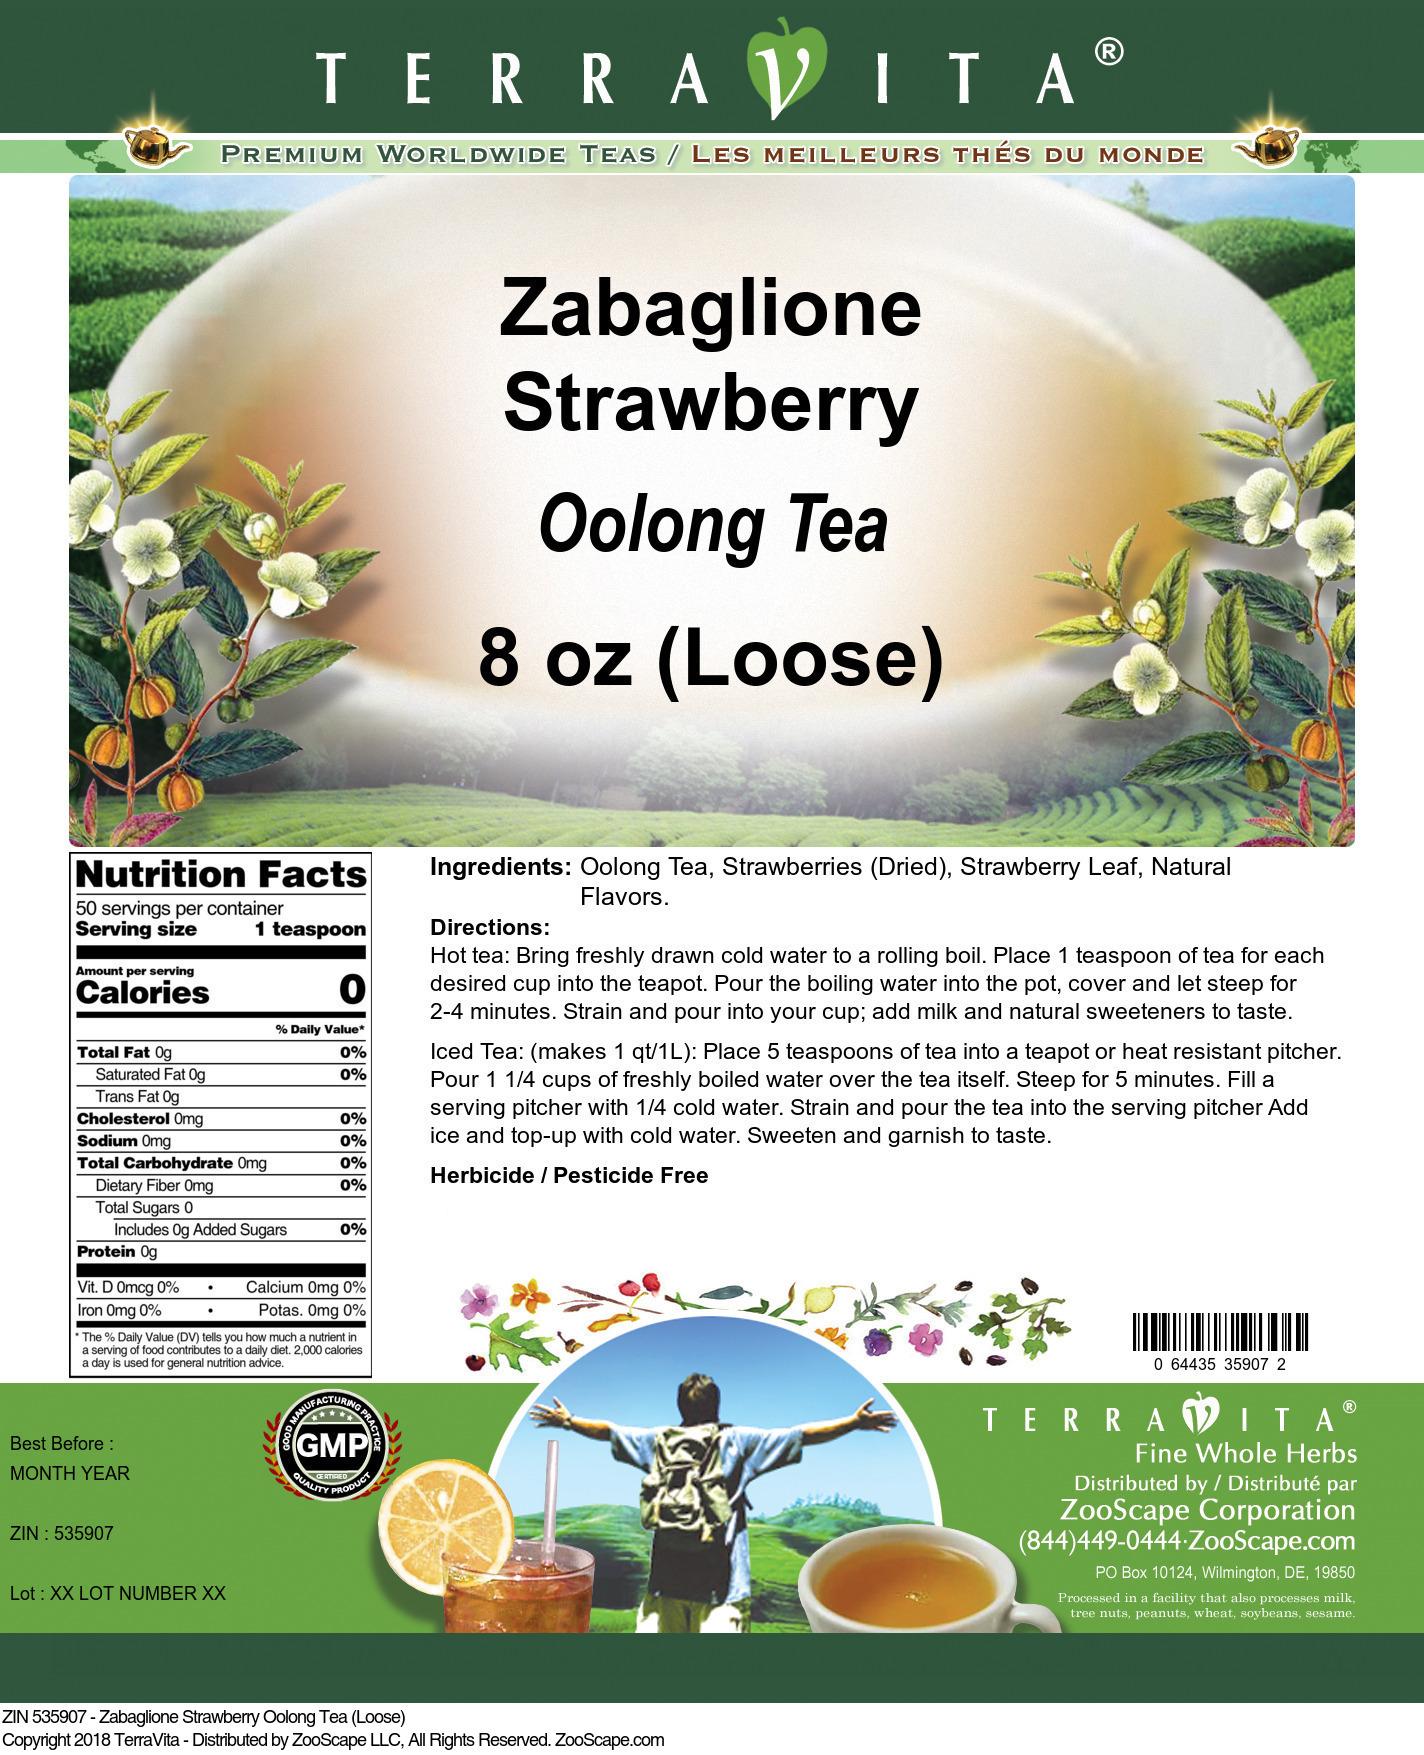 Zabaglione Strawberry Oolong Tea